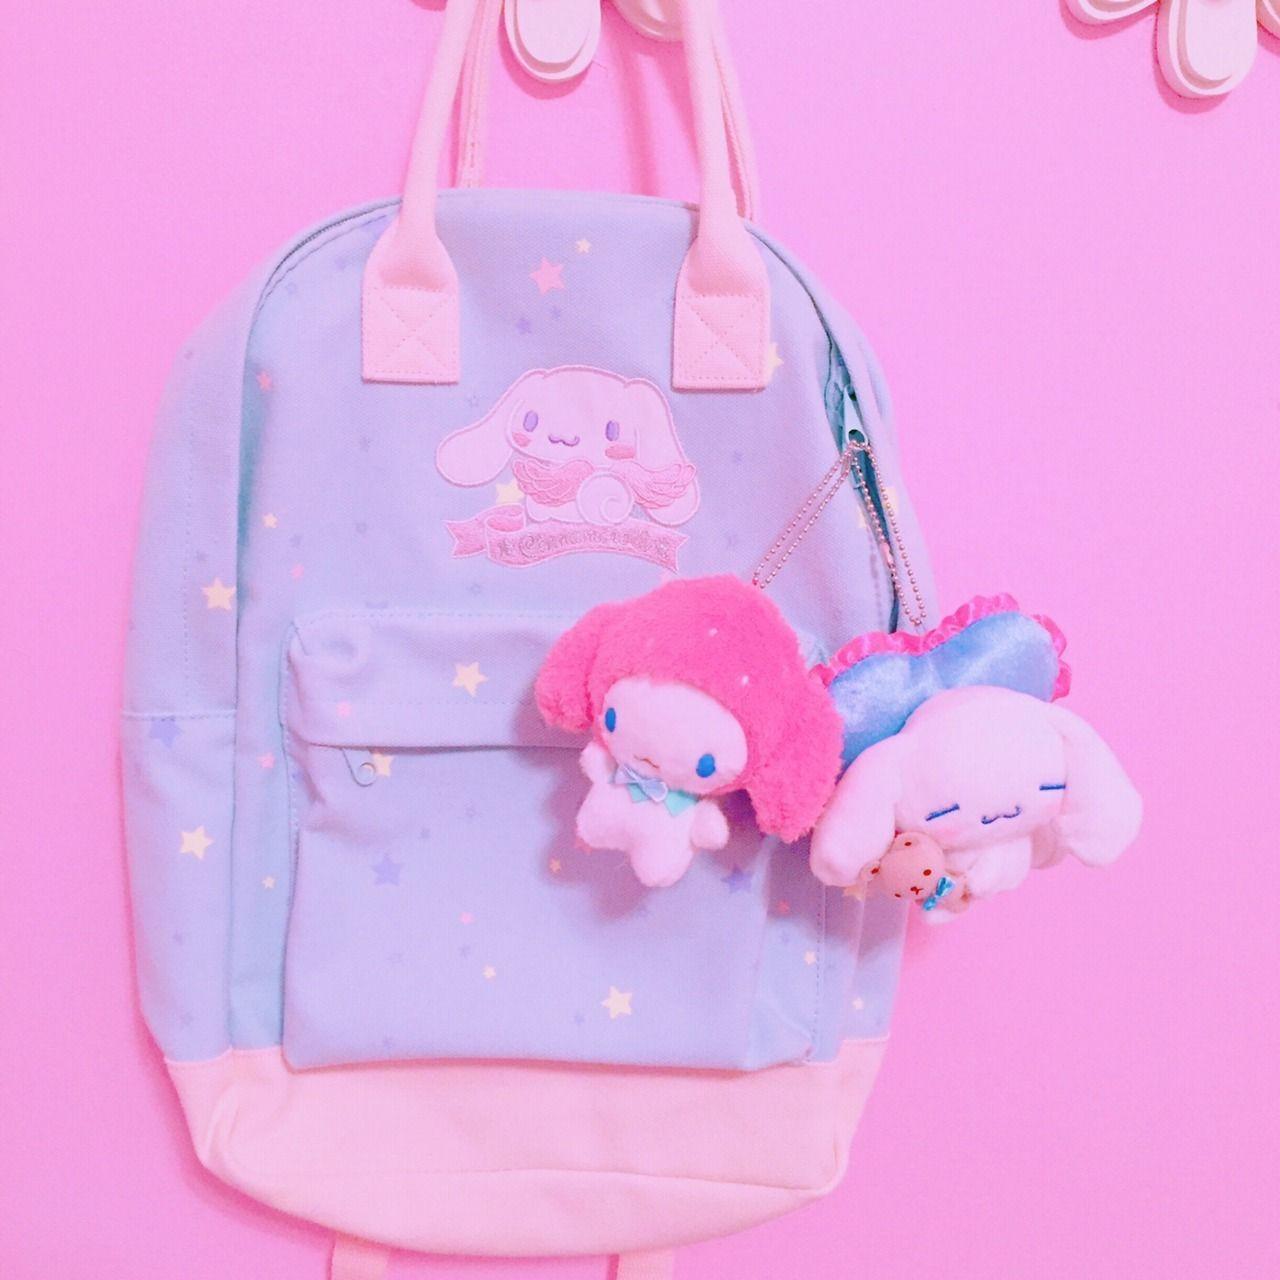 Blippo Kawaii Shop Kawaii Bags Kawaii Accessories Kawaii Toys